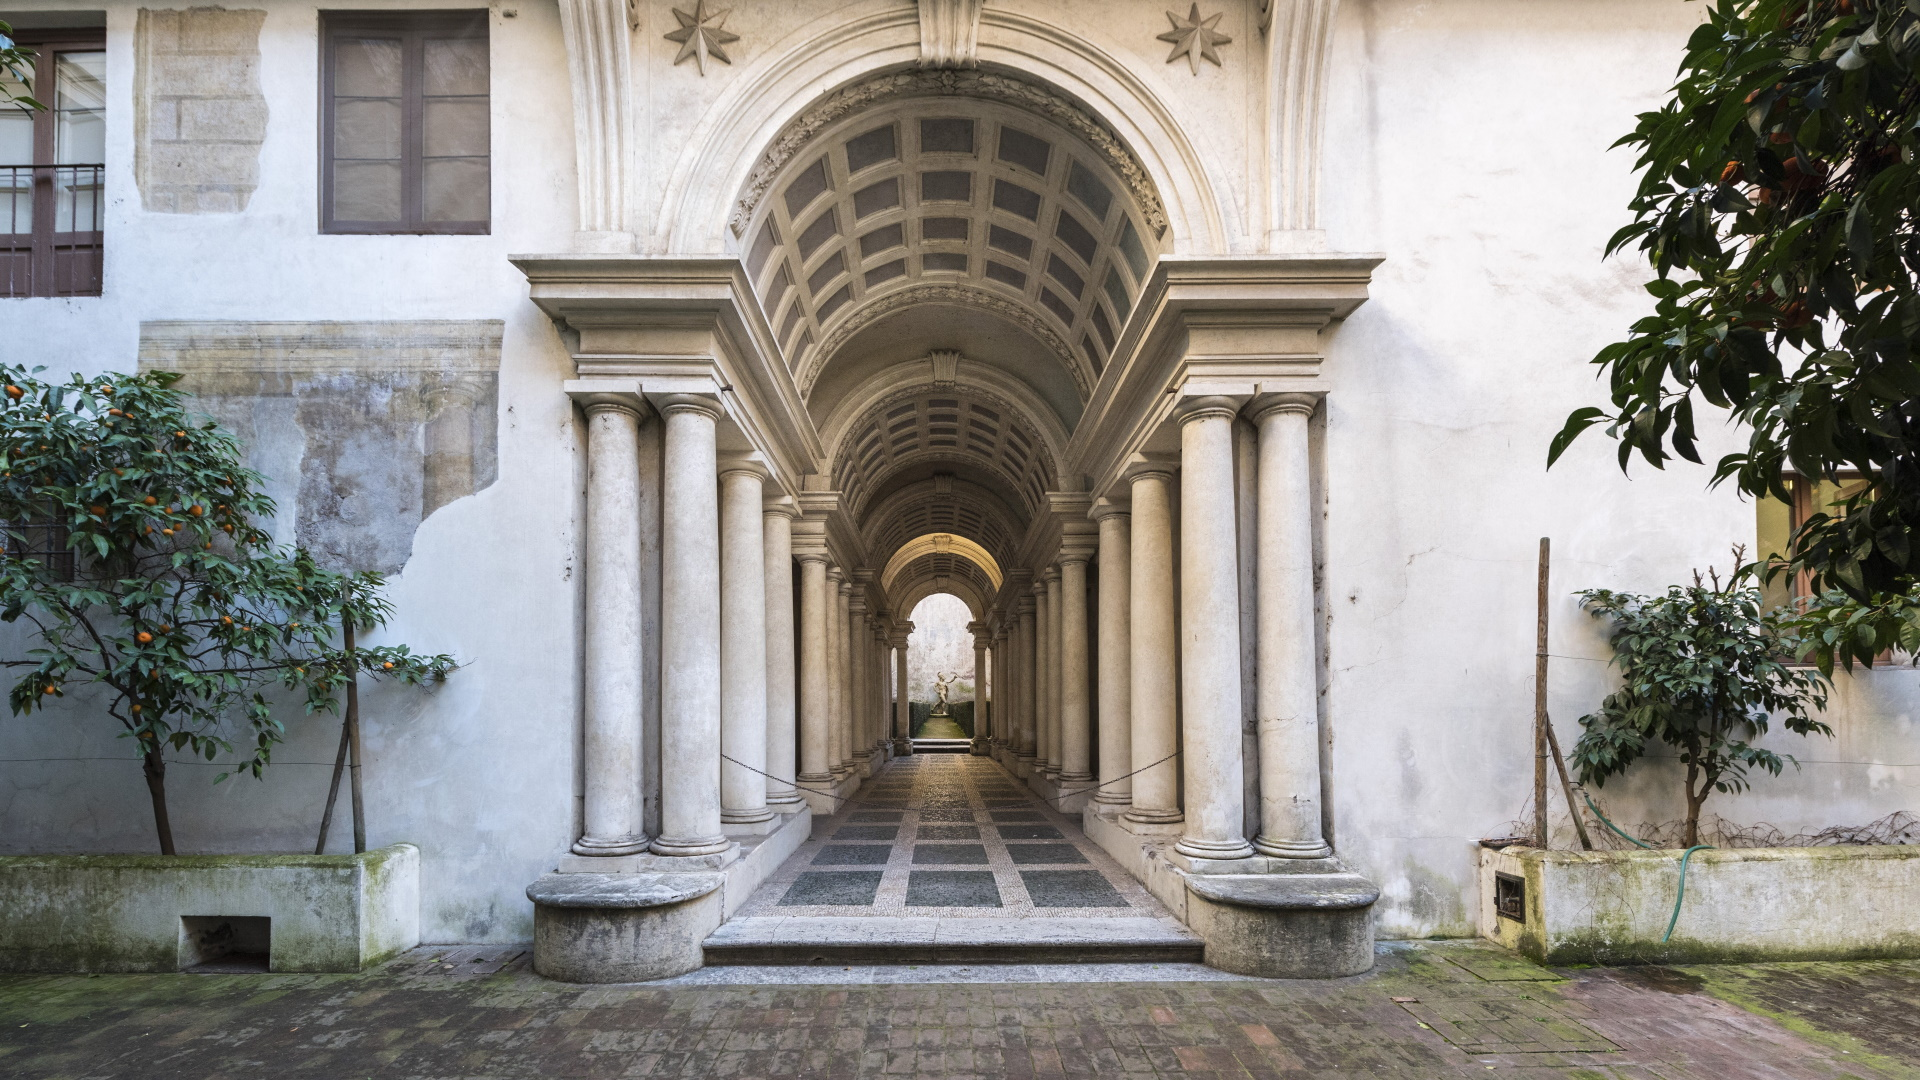 Palazzo Spada - galleria Borromini ©Adam Eastland _ AGF